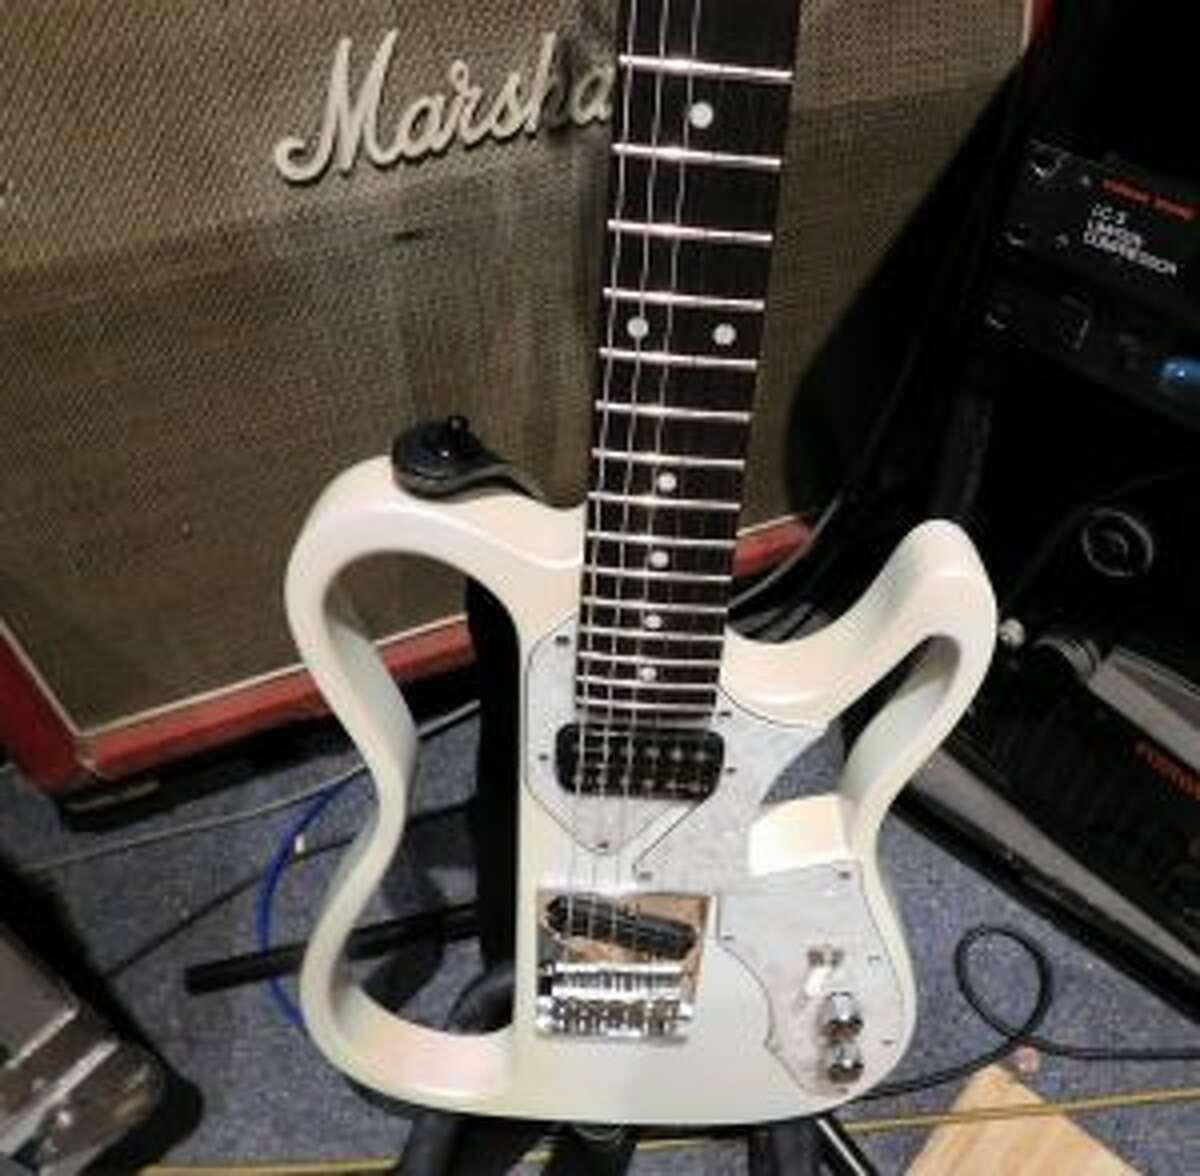 Wahlberg's custom made guitar. Brad Durrell photo